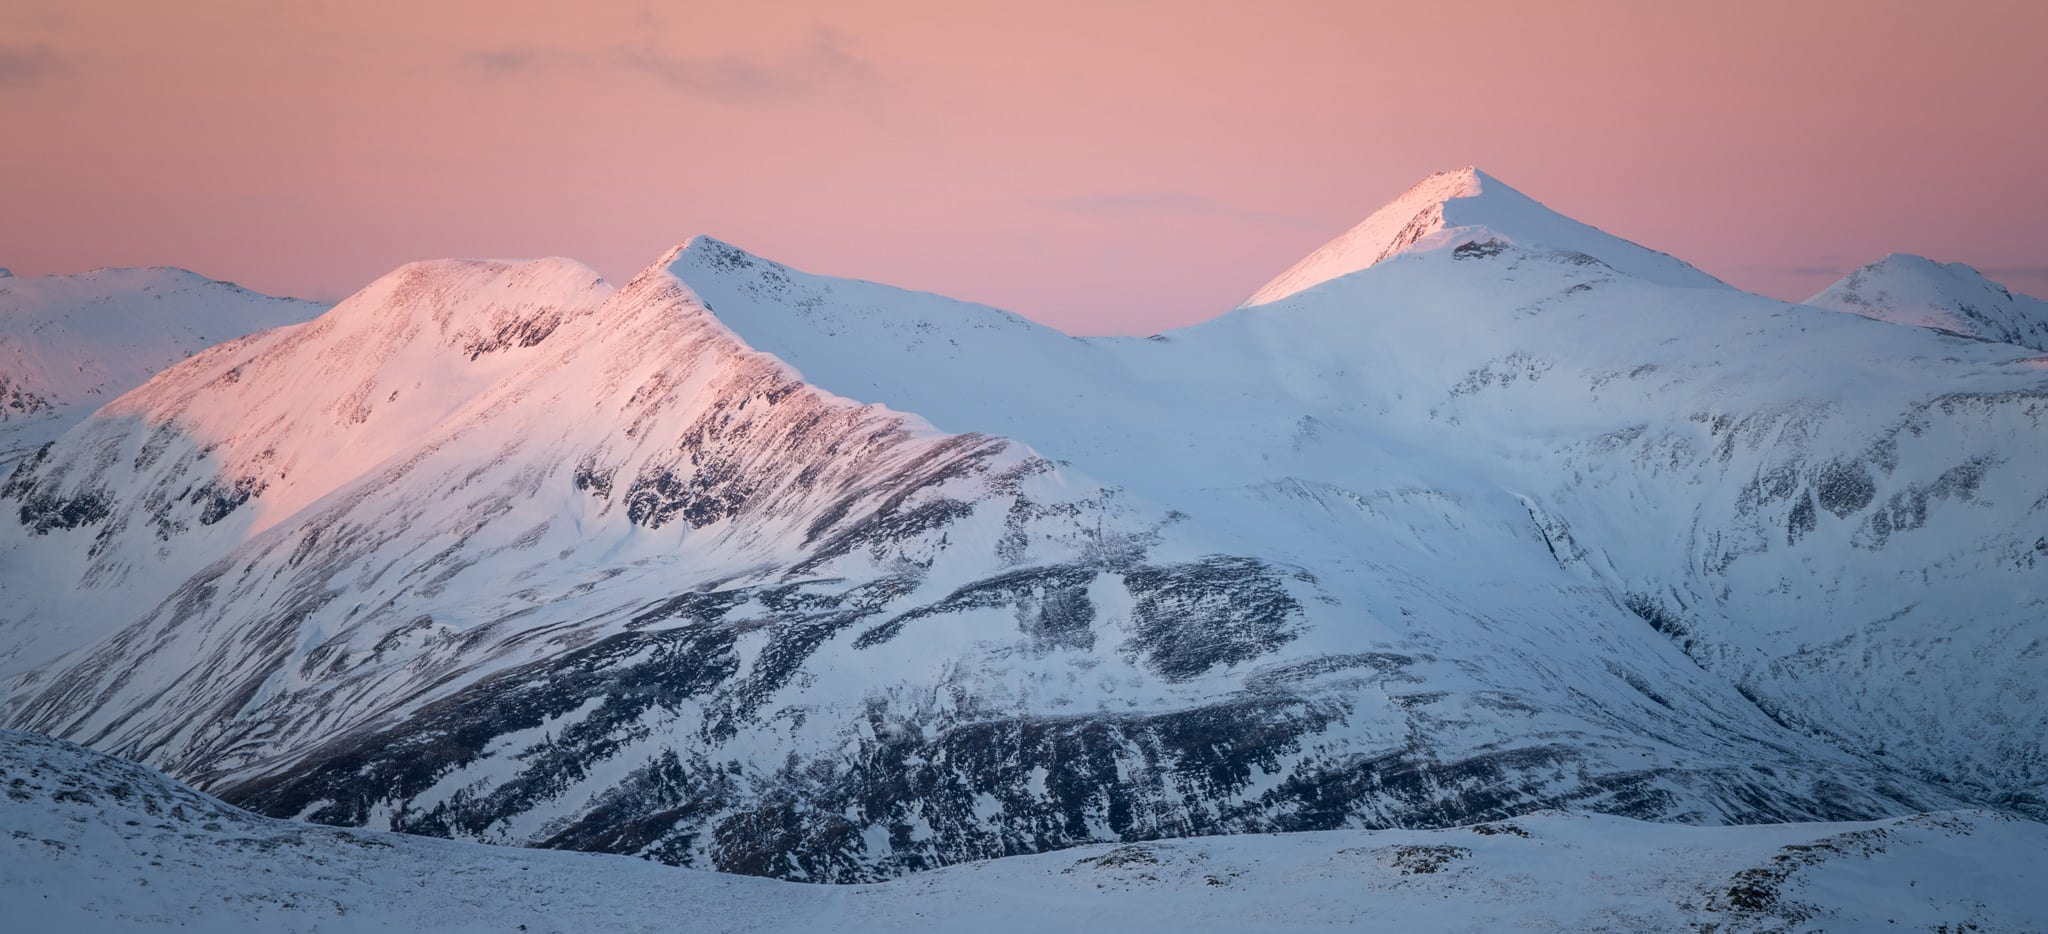 Scotland WInter Mountains - Scotland Landscape Photography